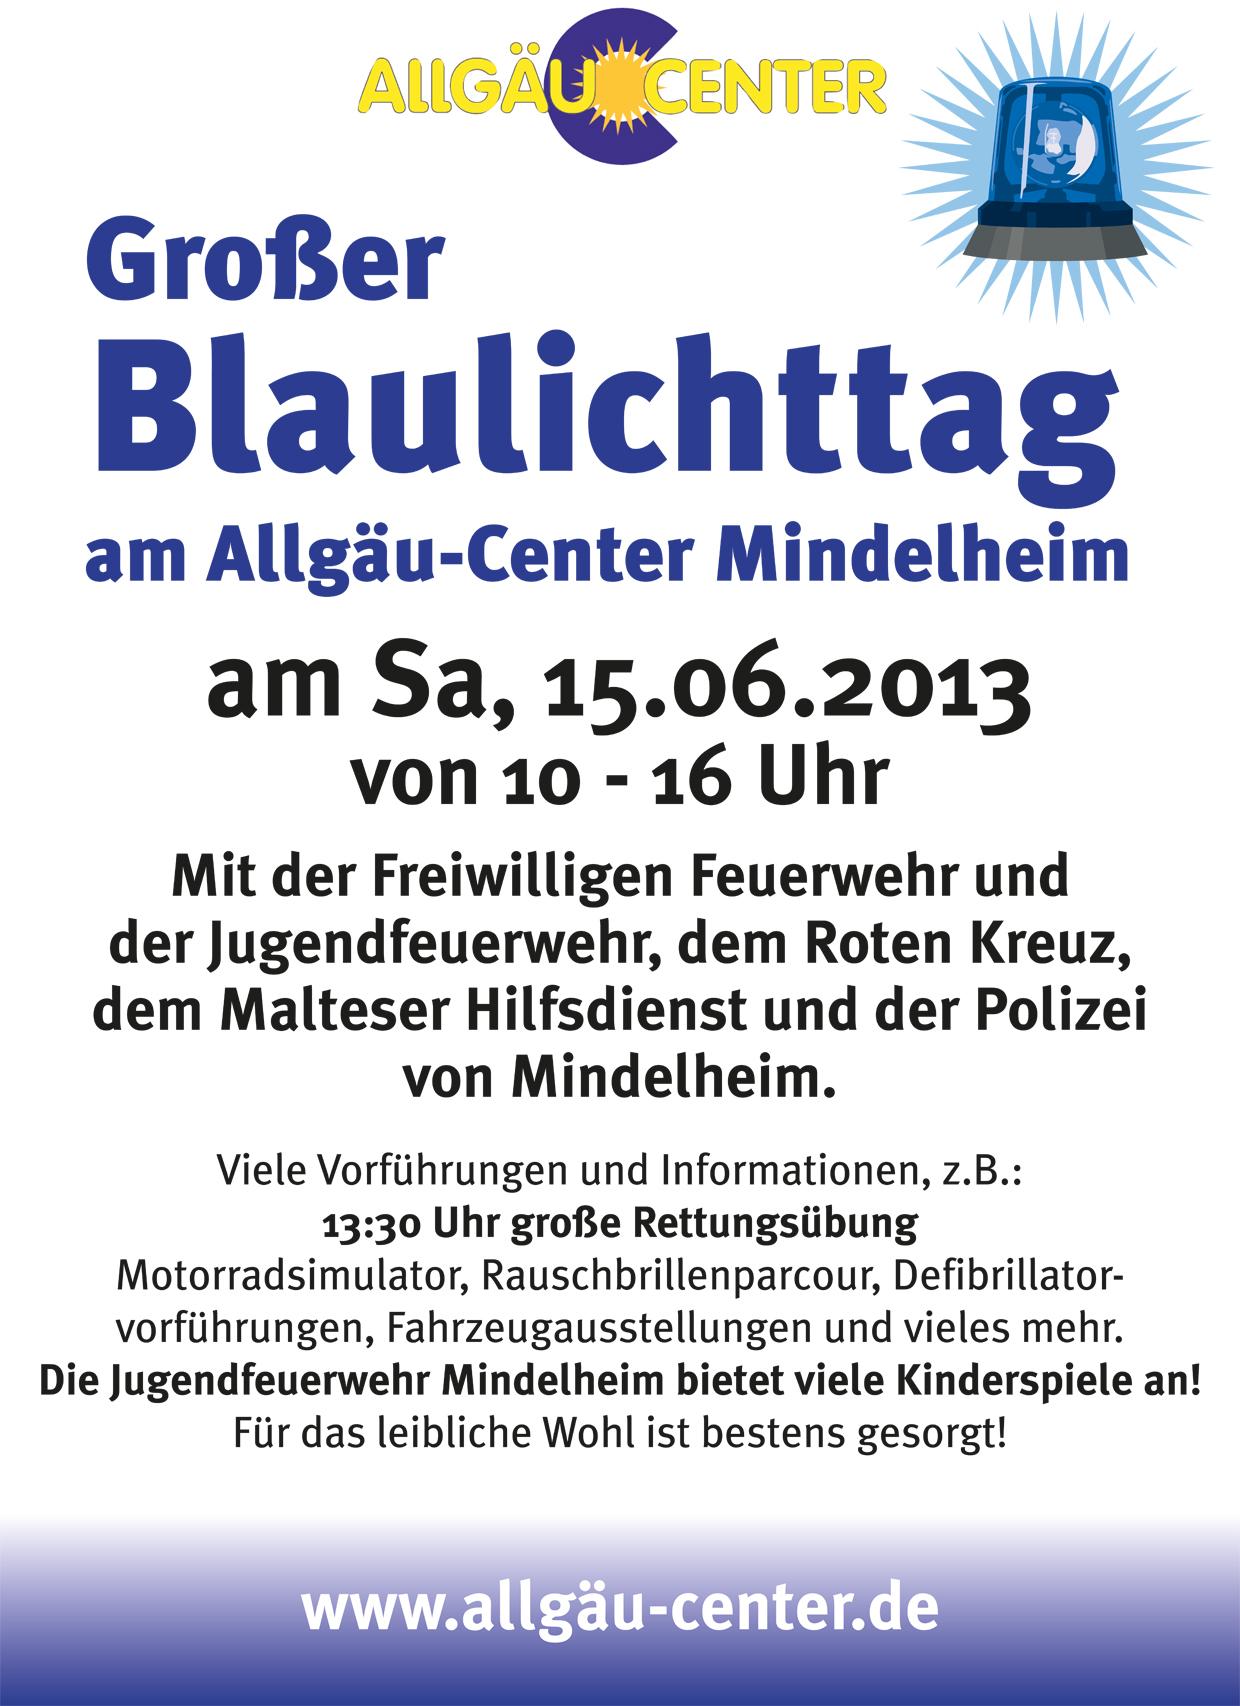 15-06-2013 blaulichttag mindelheim new-facts-eu